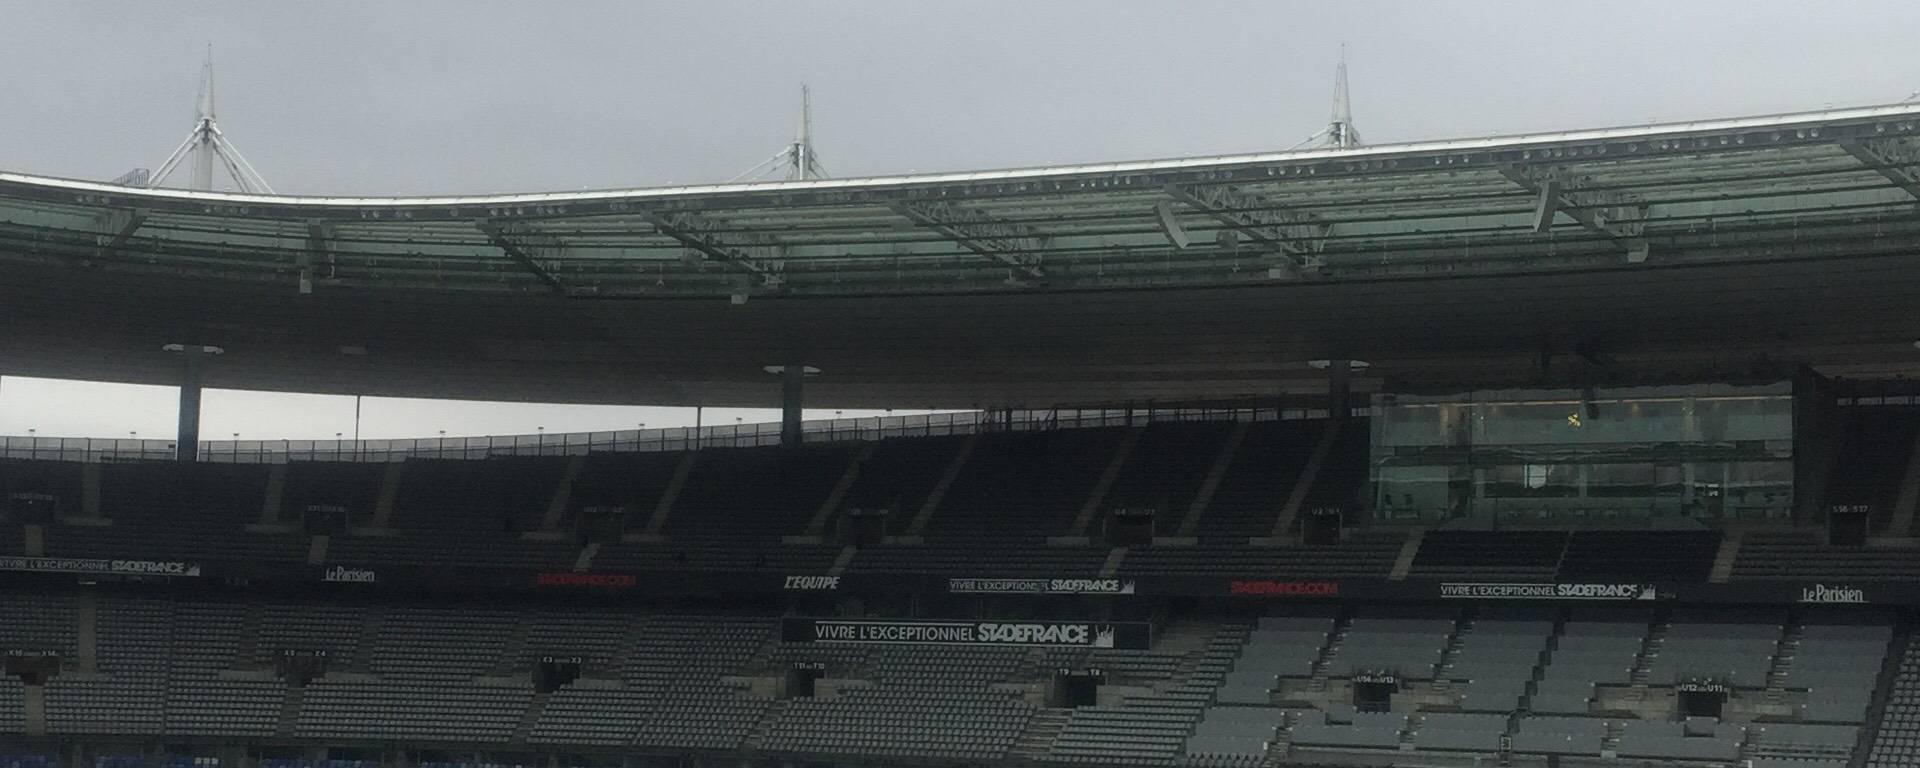 Stade de France © Charmel Maboungou